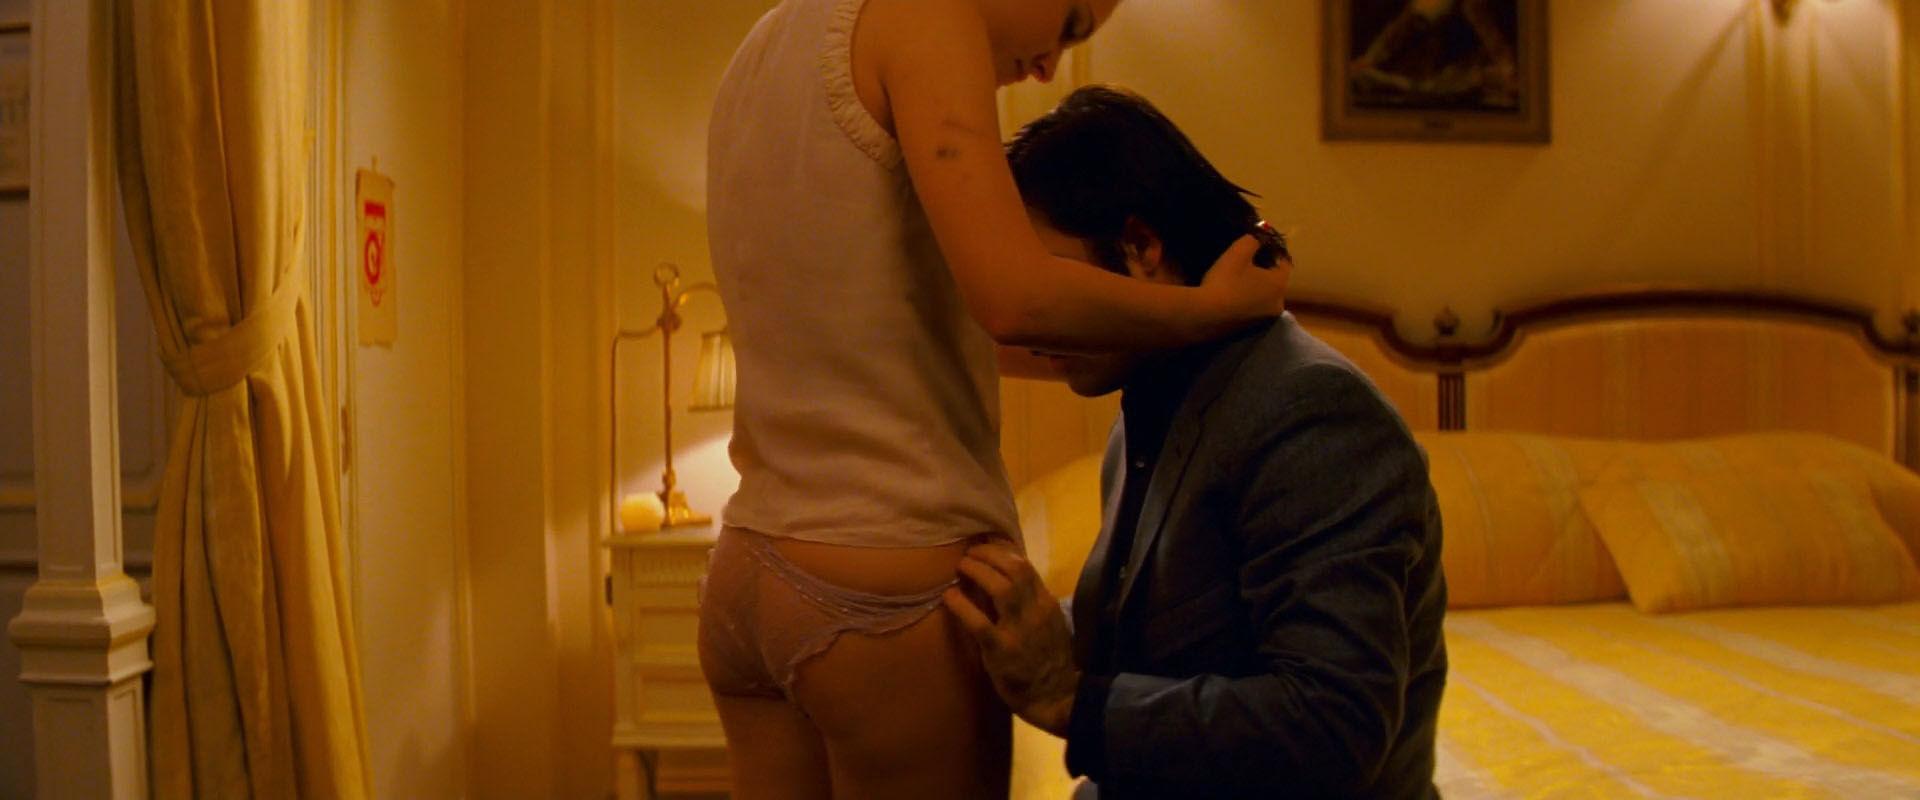 hotel chevalier nude scene